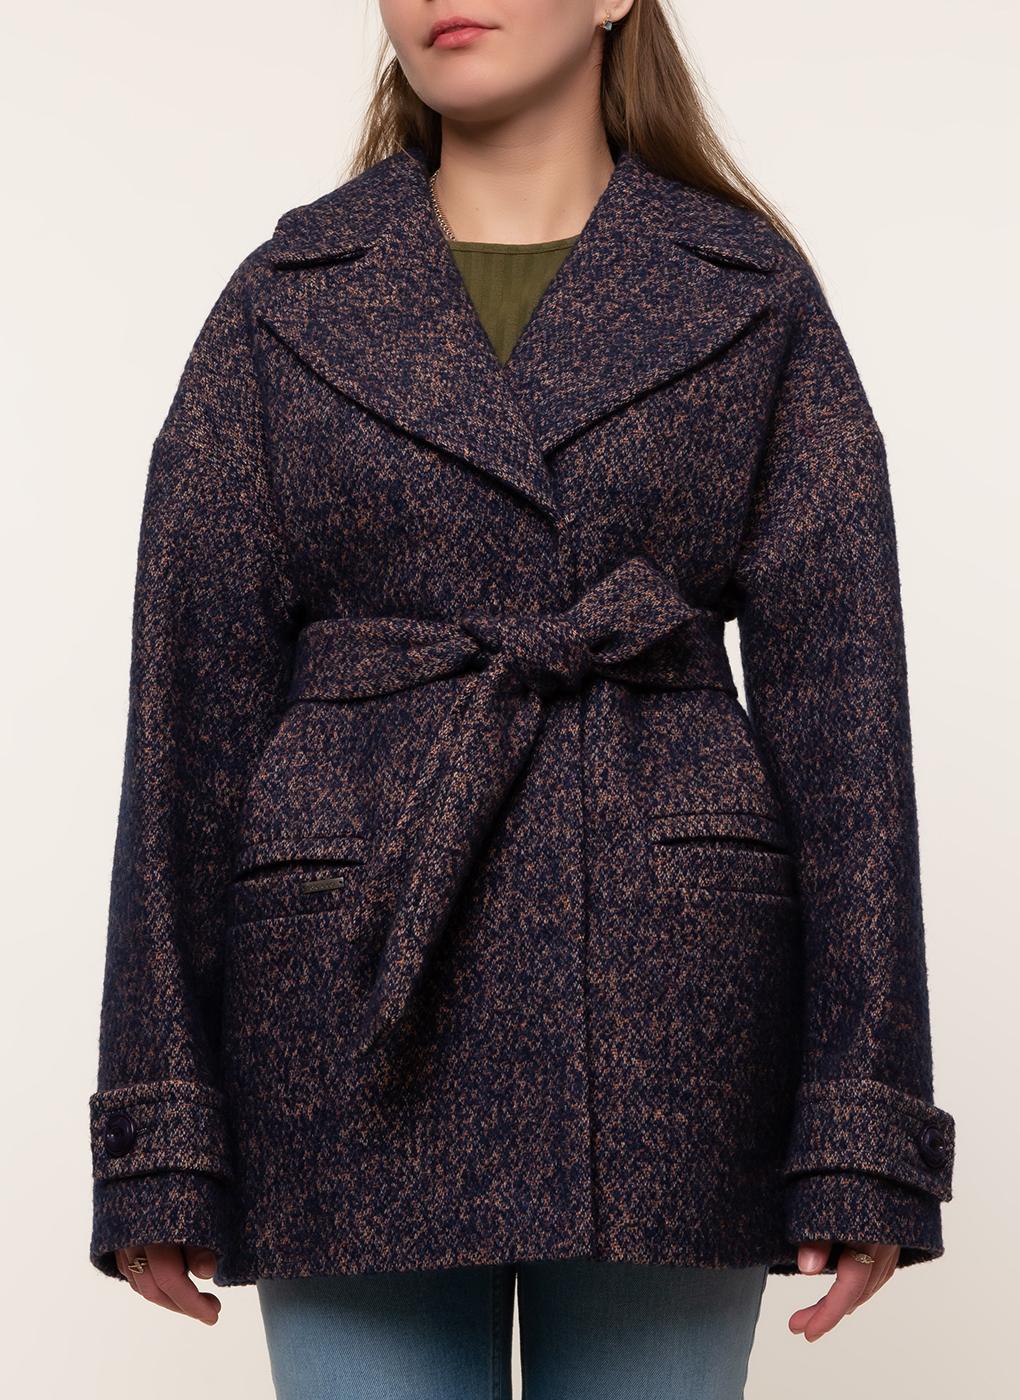 Пальто шерстяное 107, idekka фото